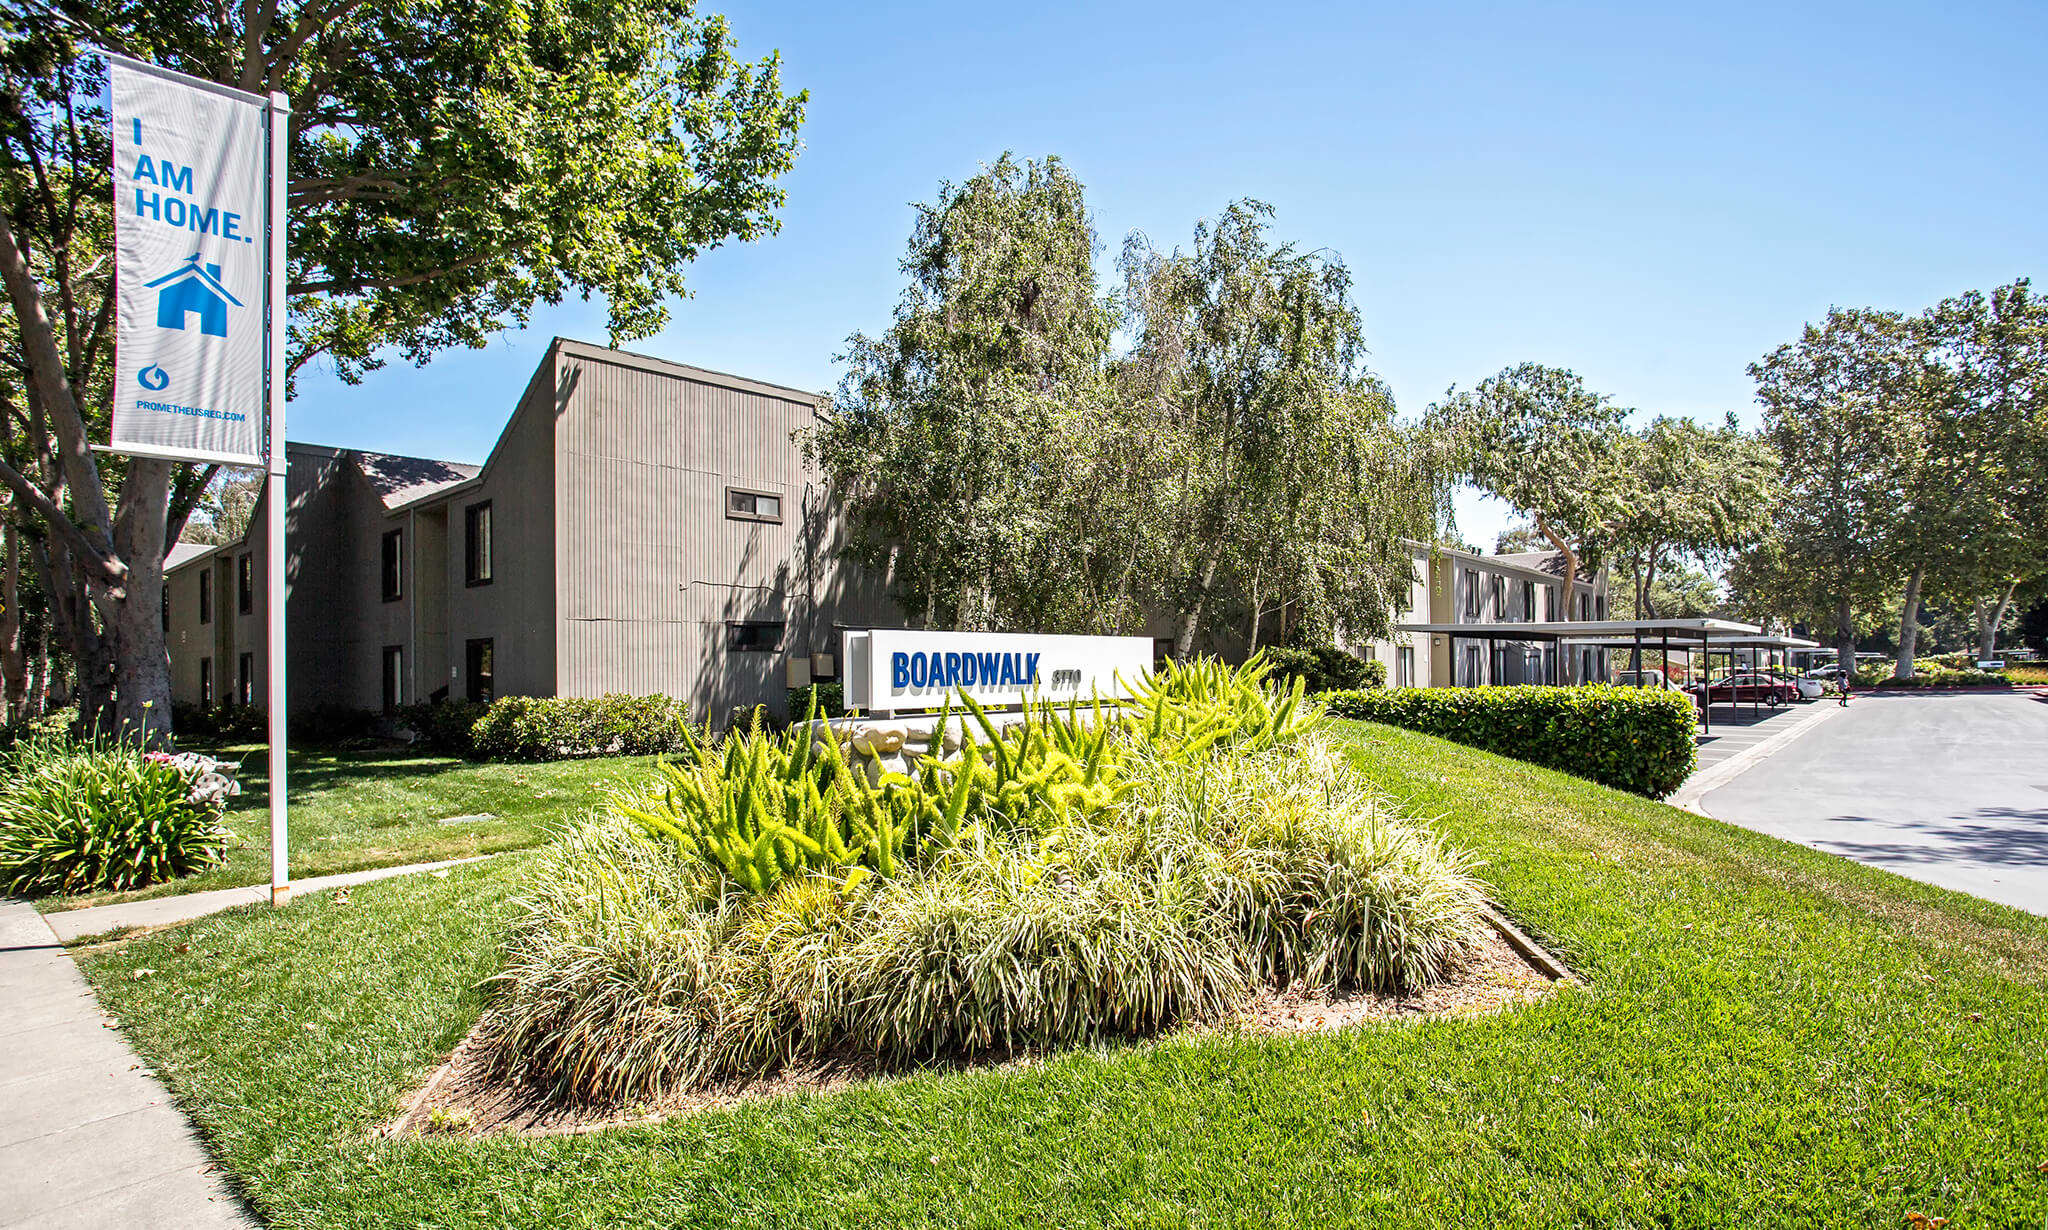 Boardwalk Apartments apartments in Santa Clara CA to rent photo 2